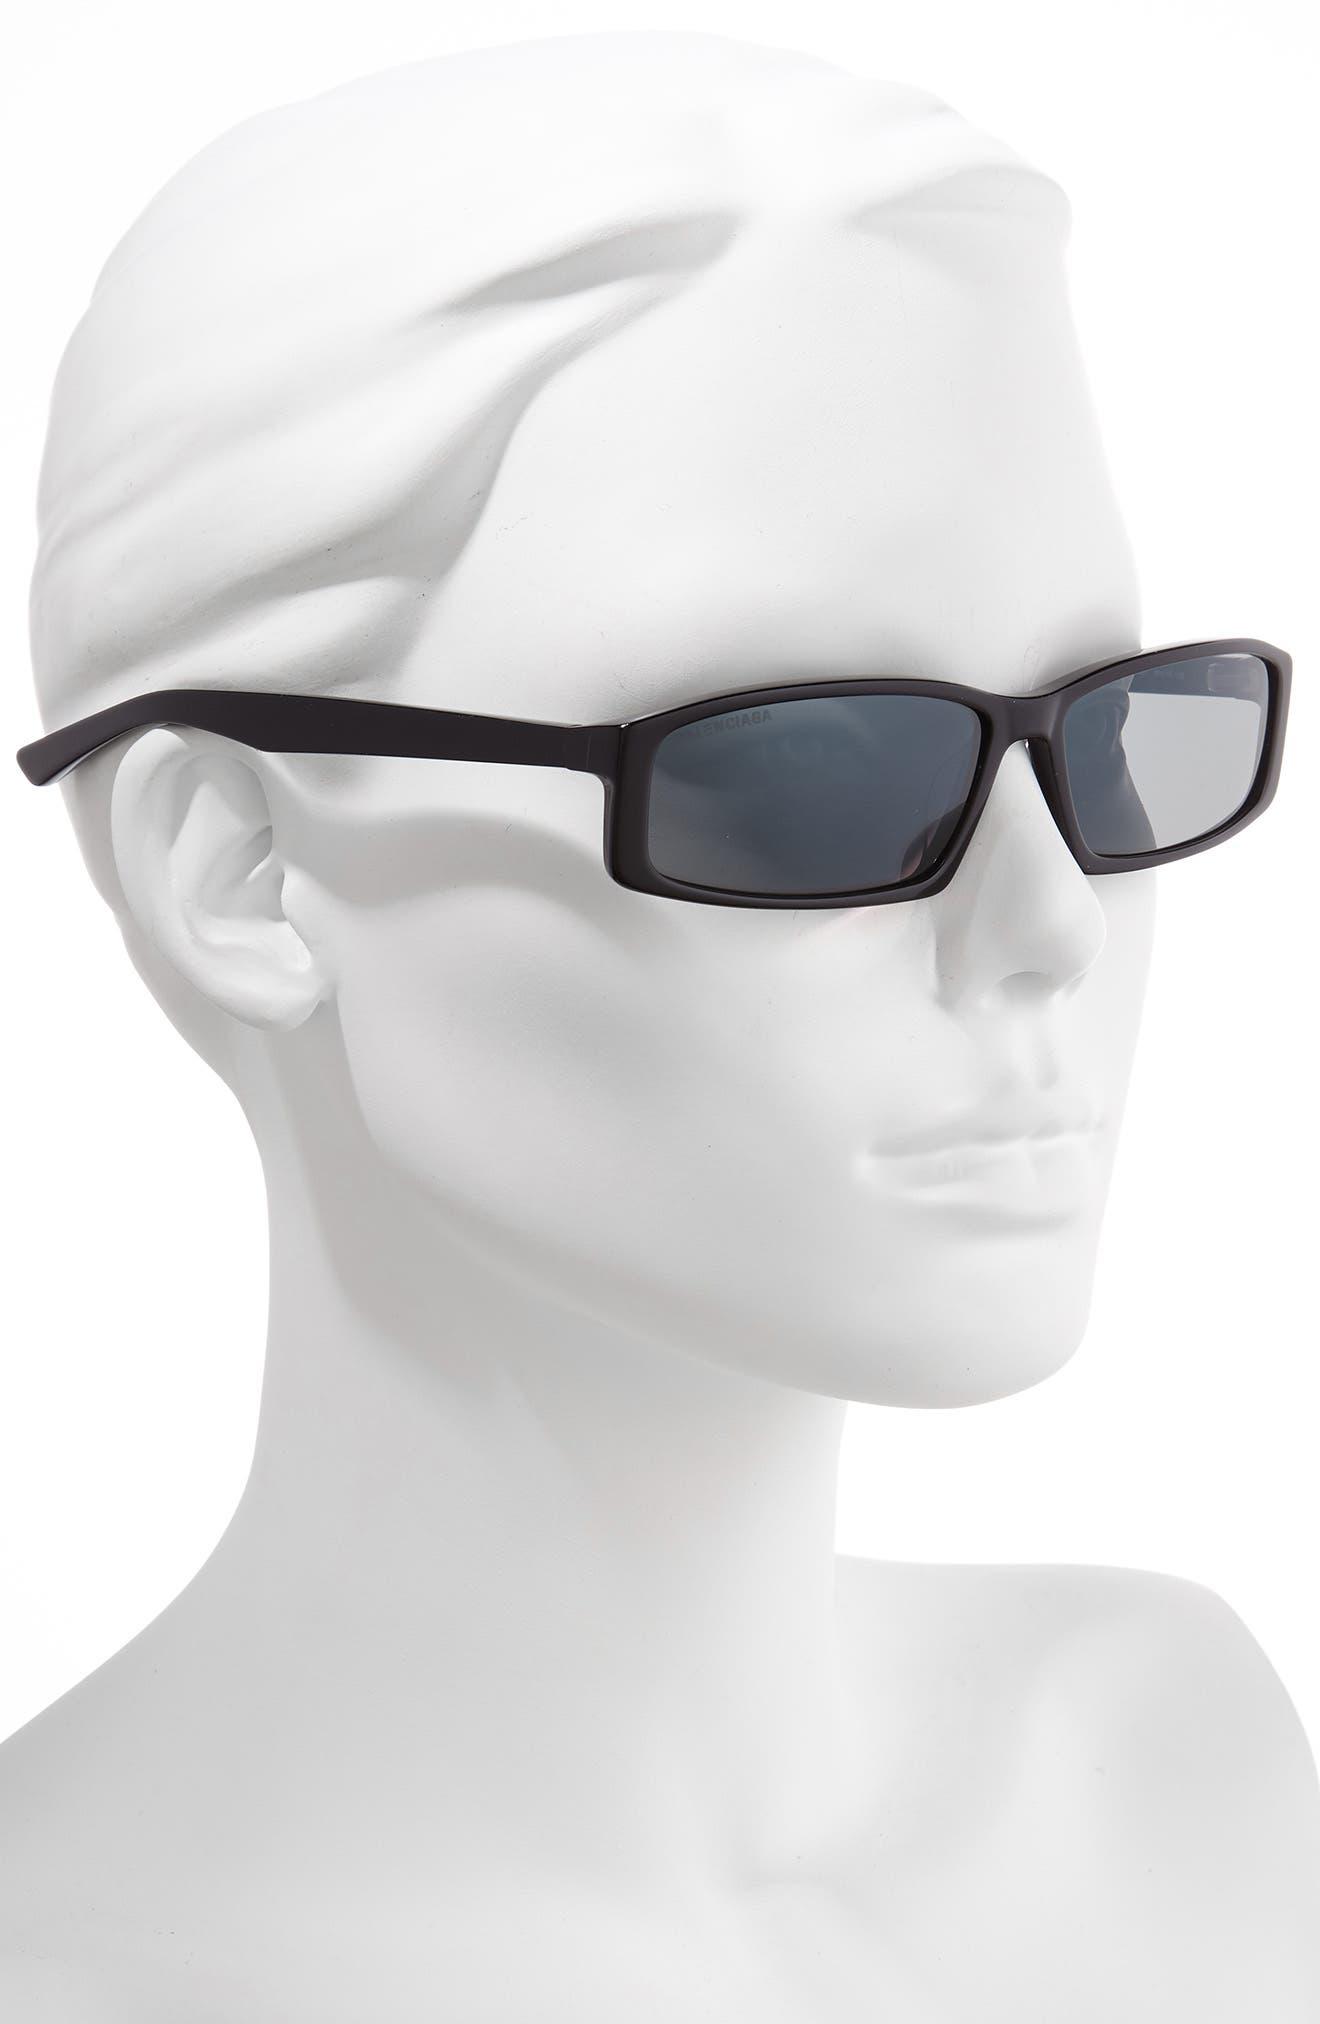 BALENCIAGA, 60mm Rectangle Sunglasses, Alternate thumbnail 2, color, SHINY BLACK/ GREY